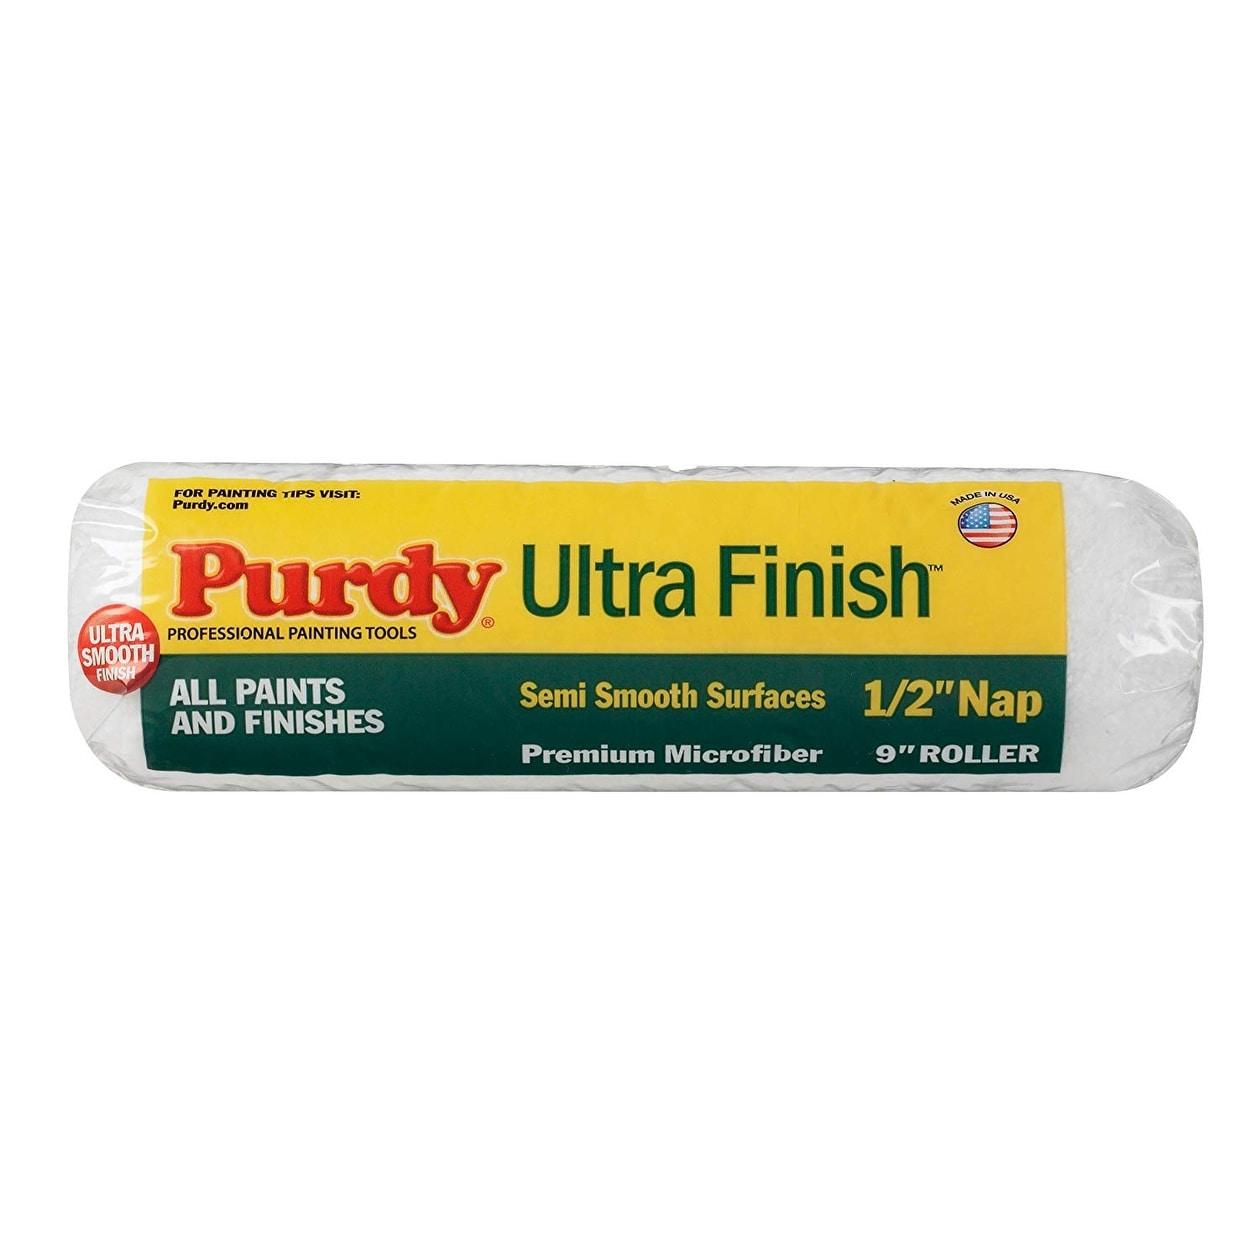 Purdy 140678093 Ultra Finish Polypropylene Roller Cover, 9, 1/2 Nap, 1-1/2